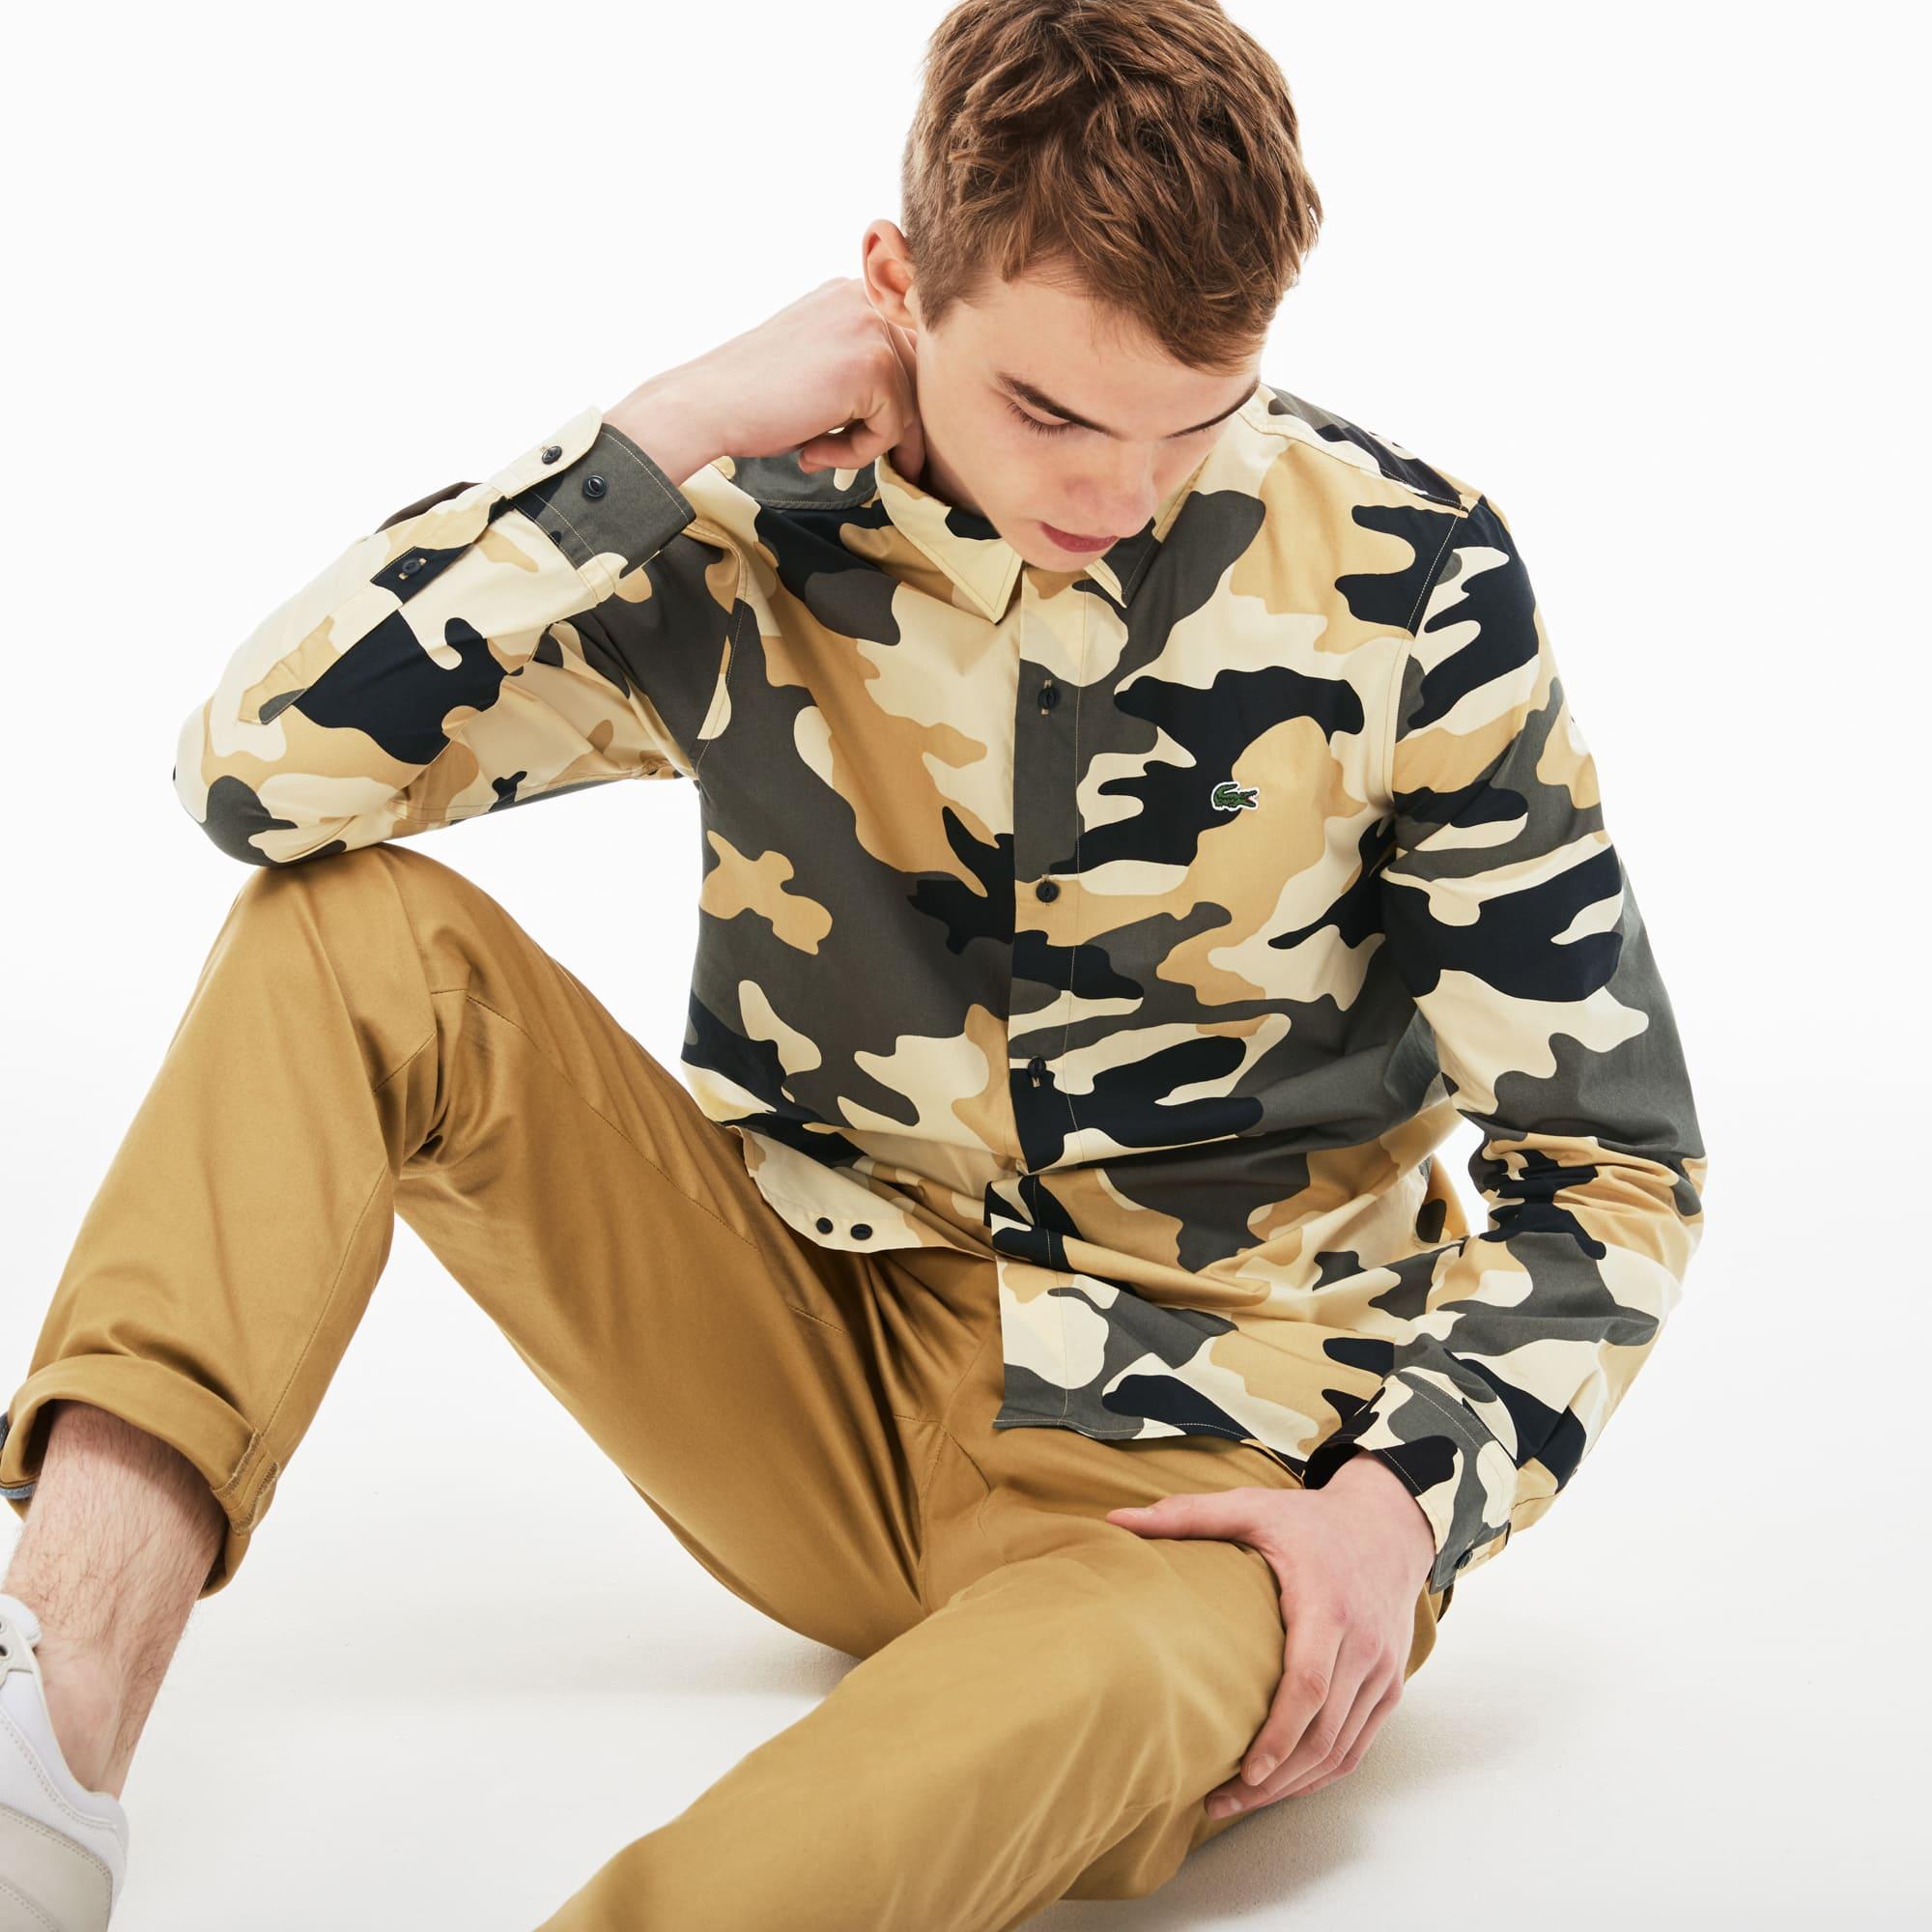 Skinny Fit Herren-Hemd aus Popeline mit Tarnmuster LACOSTE L!VE